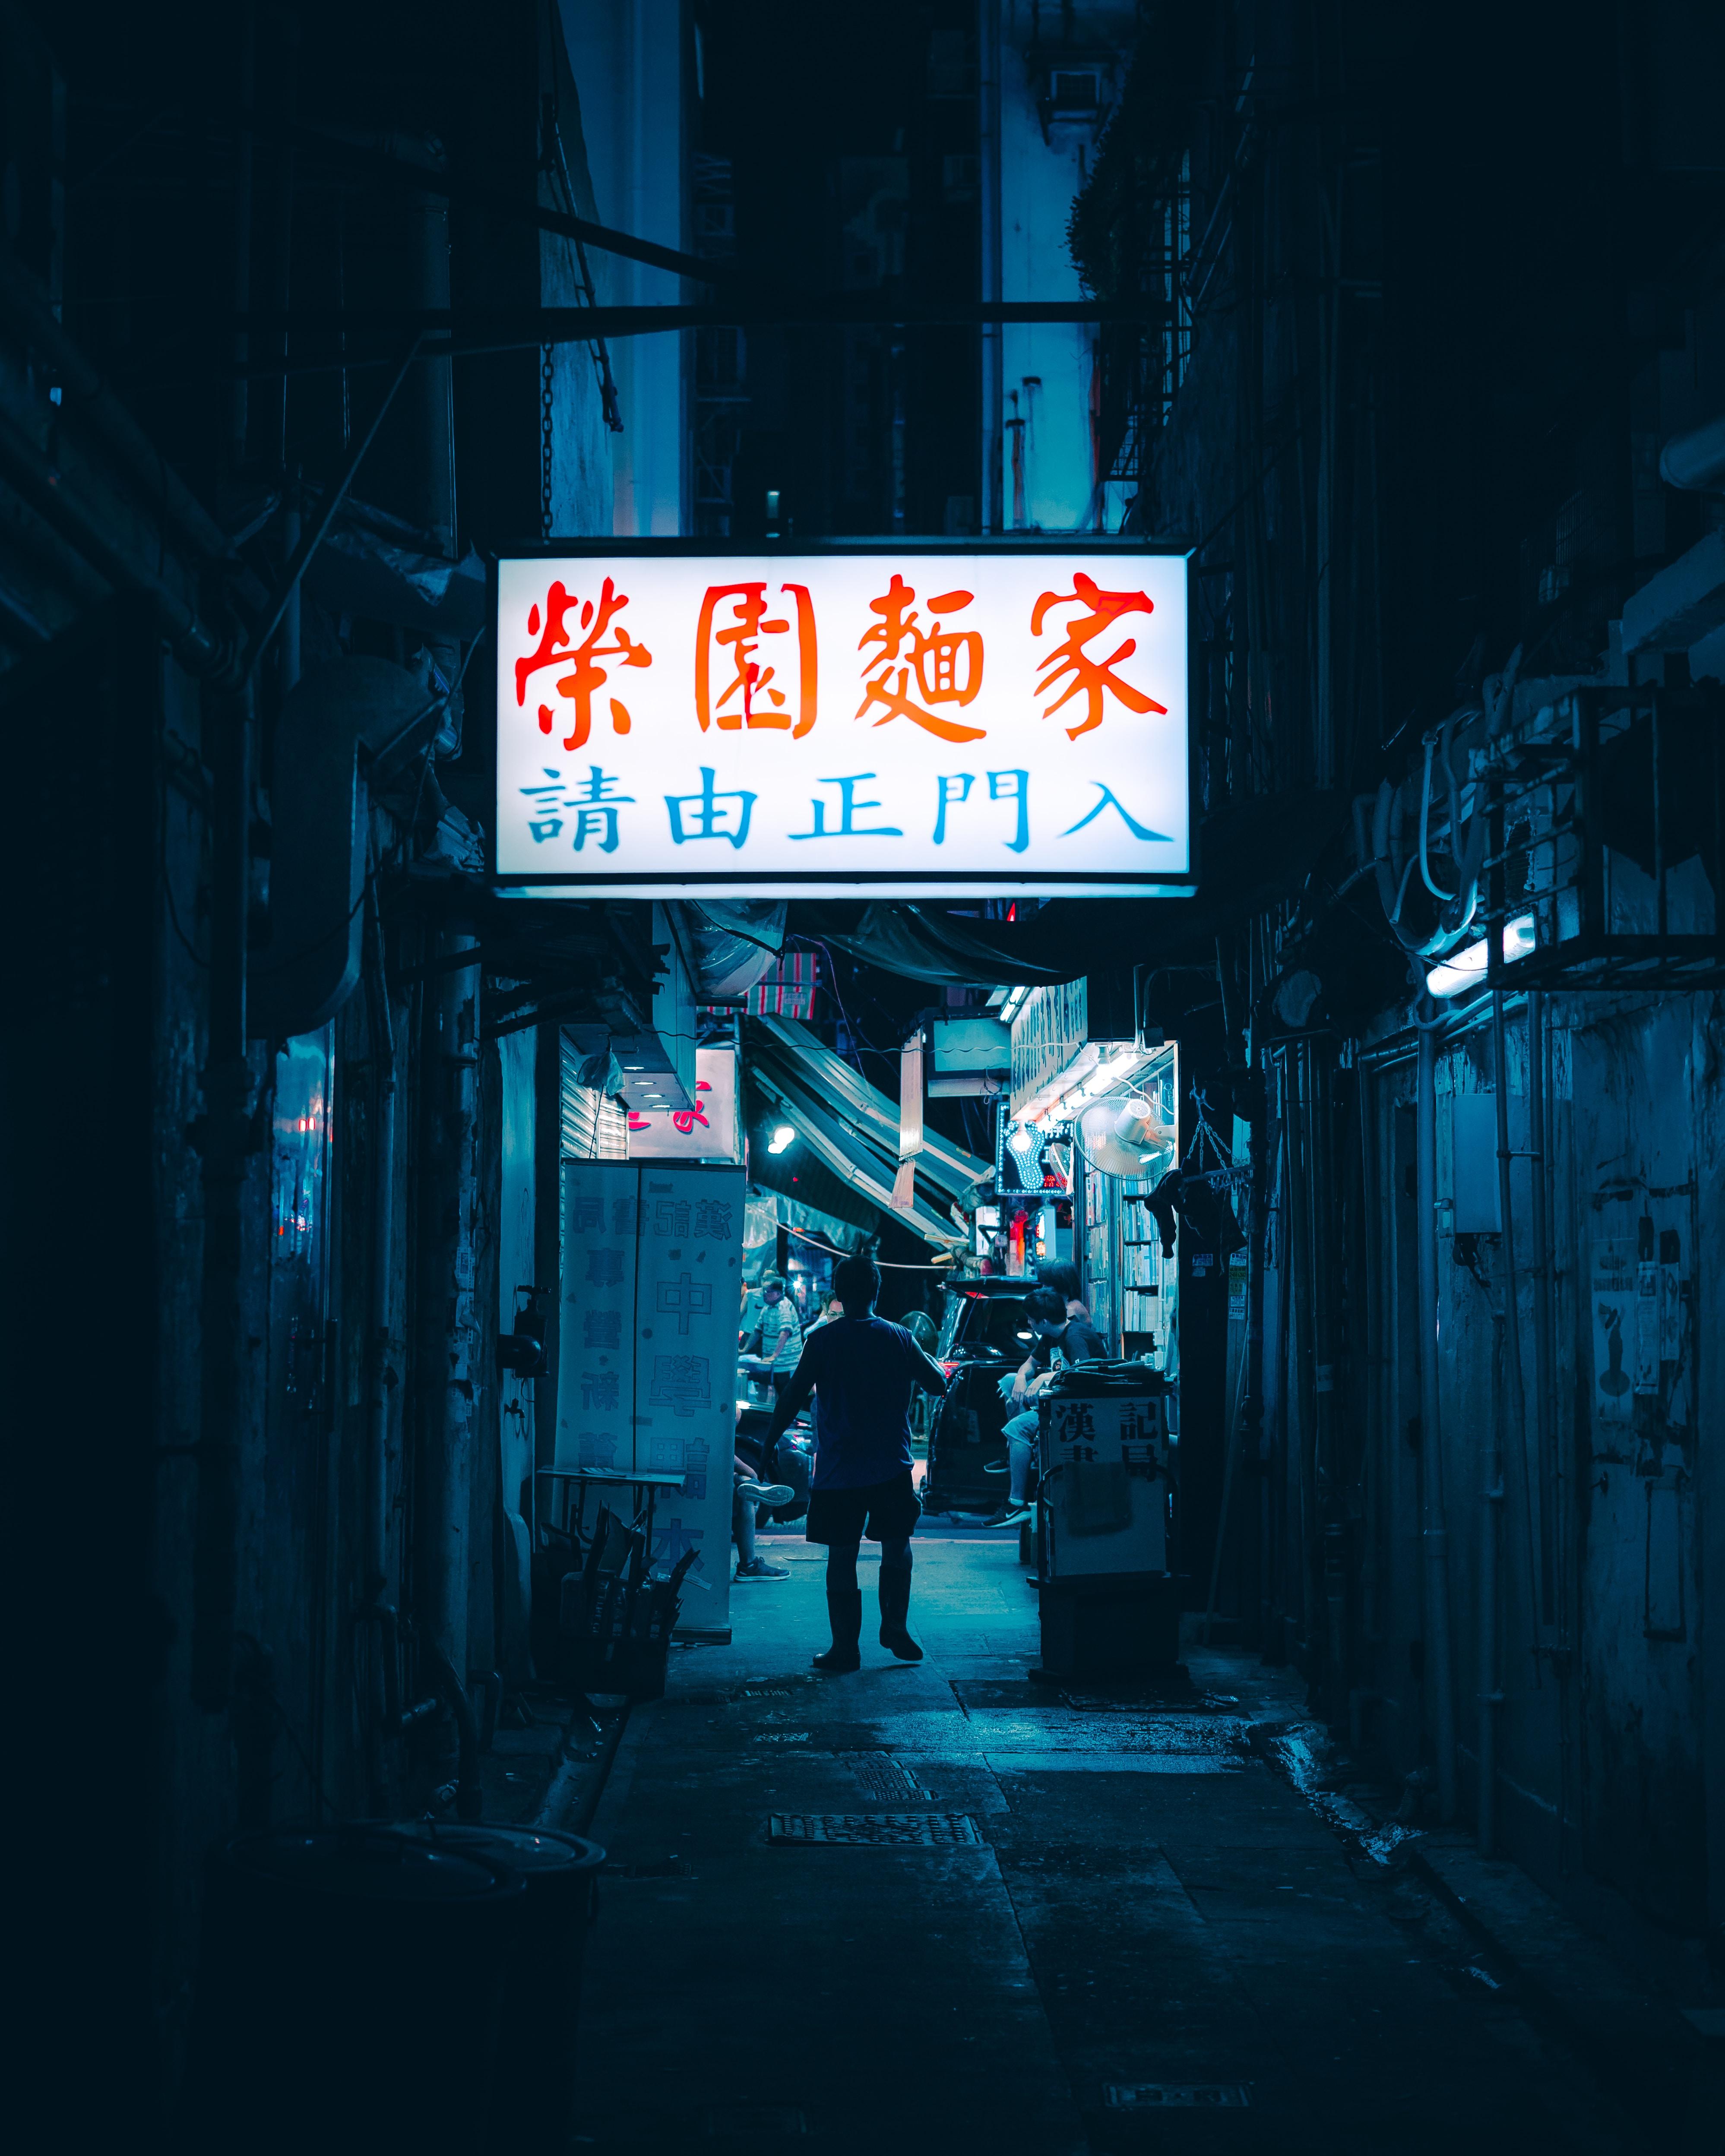 Kanji script store signage